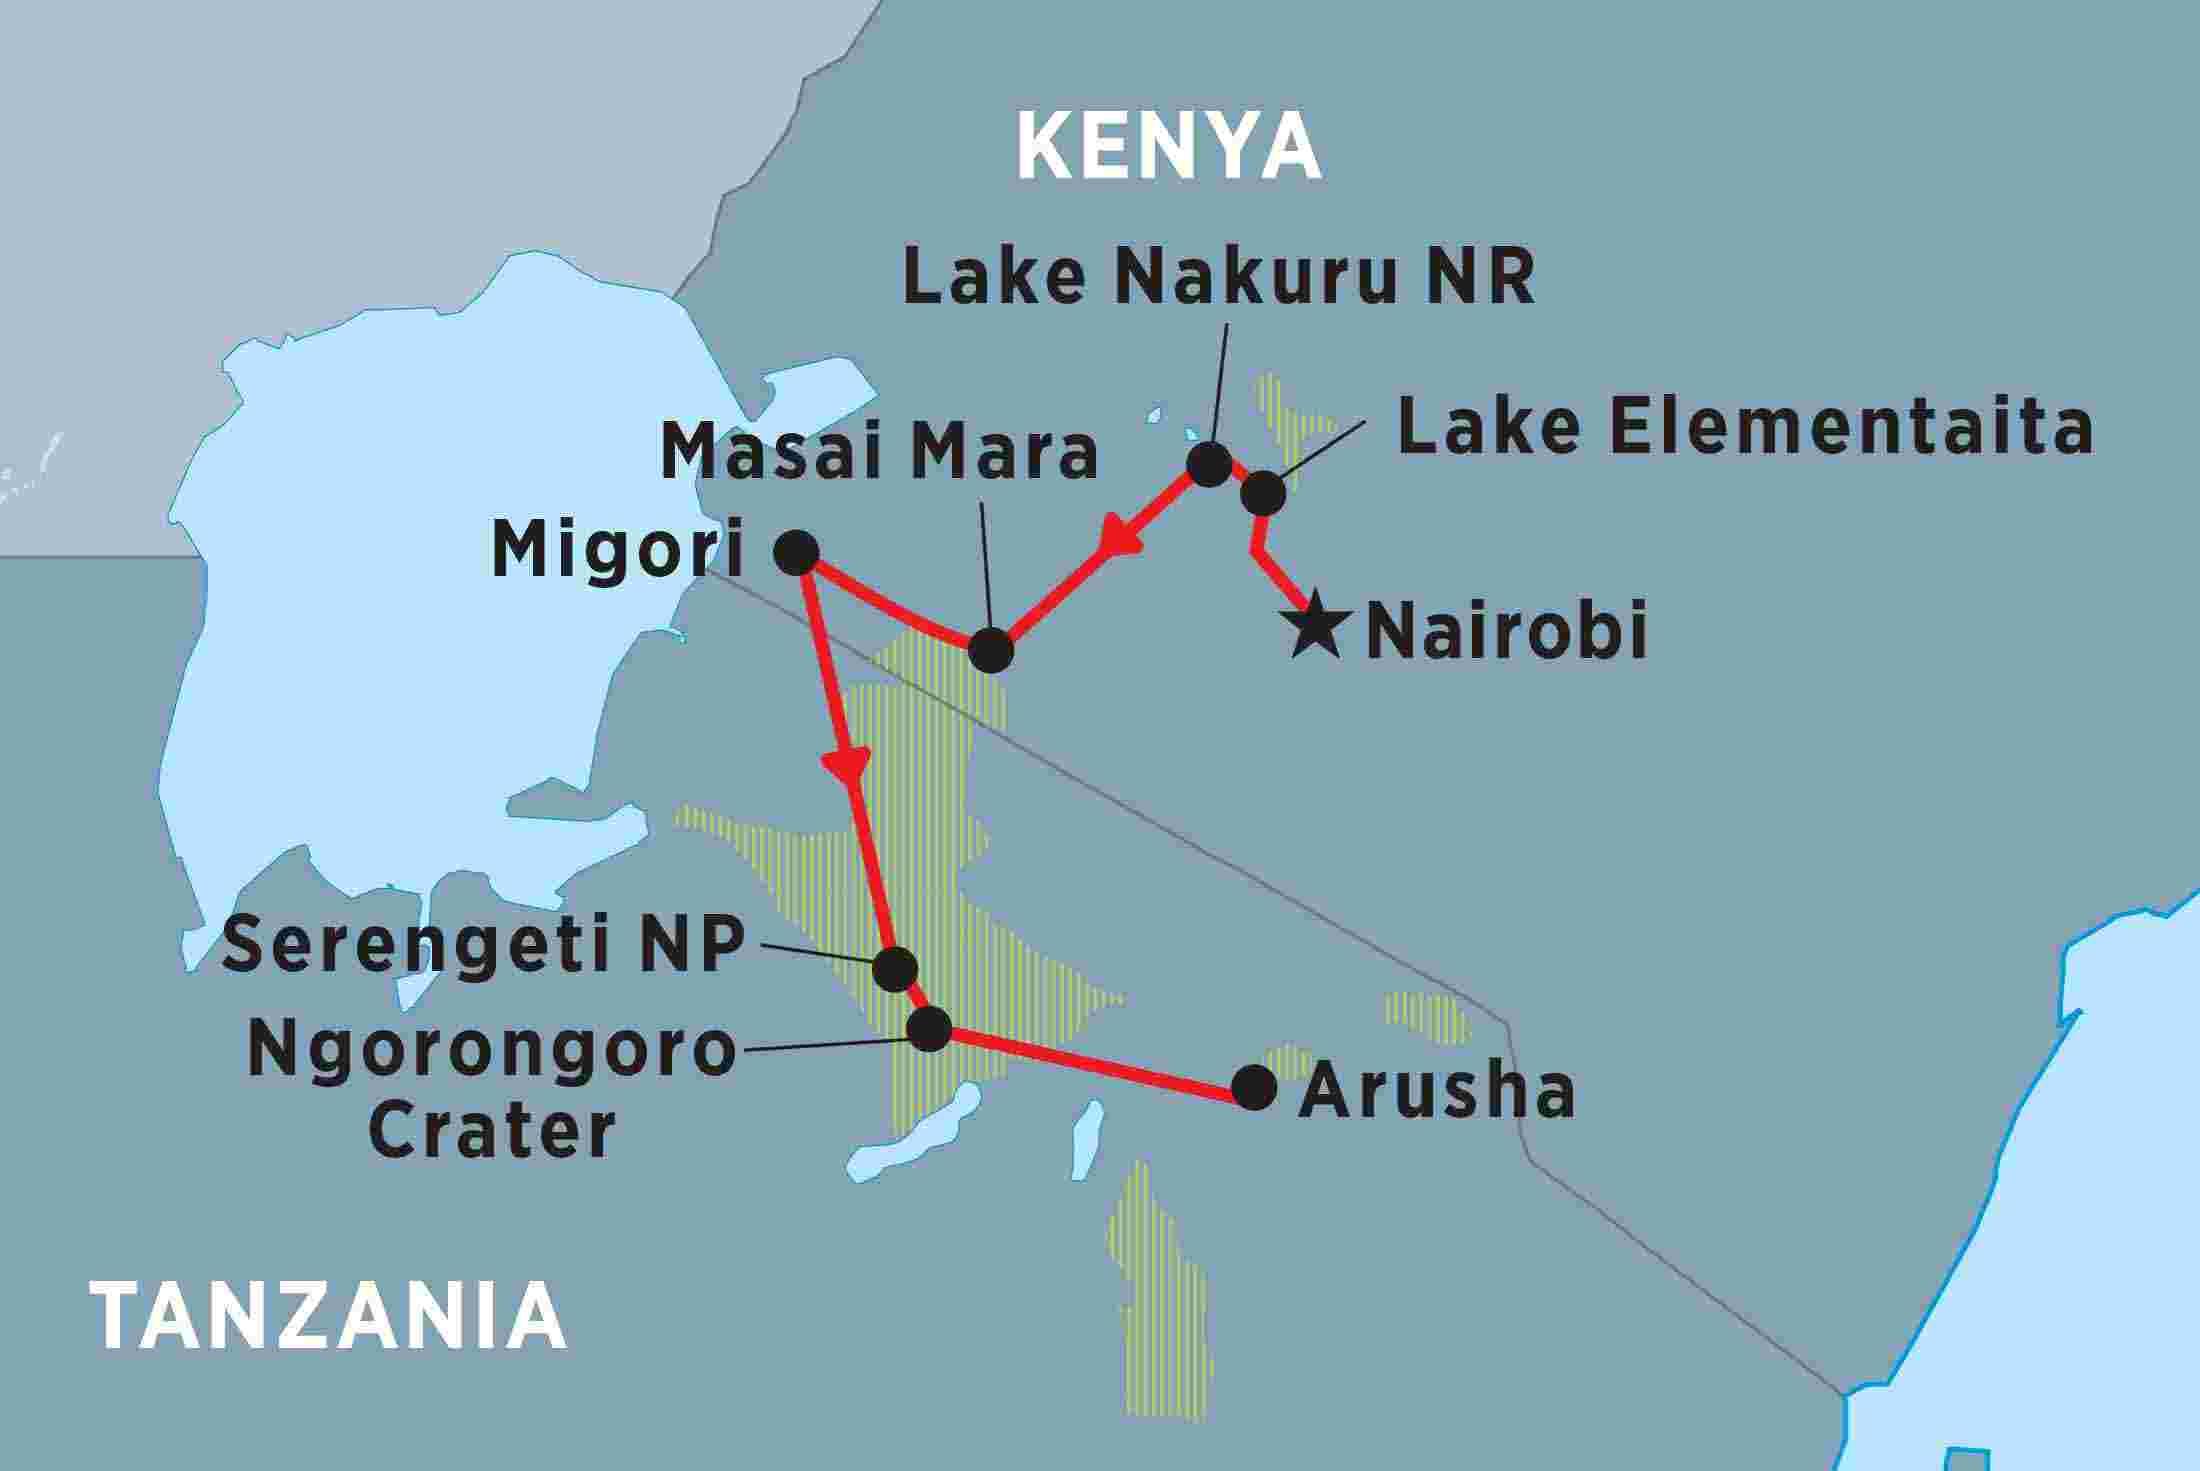 Africa's Top Wildlife Countries: Botswana, Kenya, Namibia, Rwanda, South Africa, Tanzania, Uganda, Z